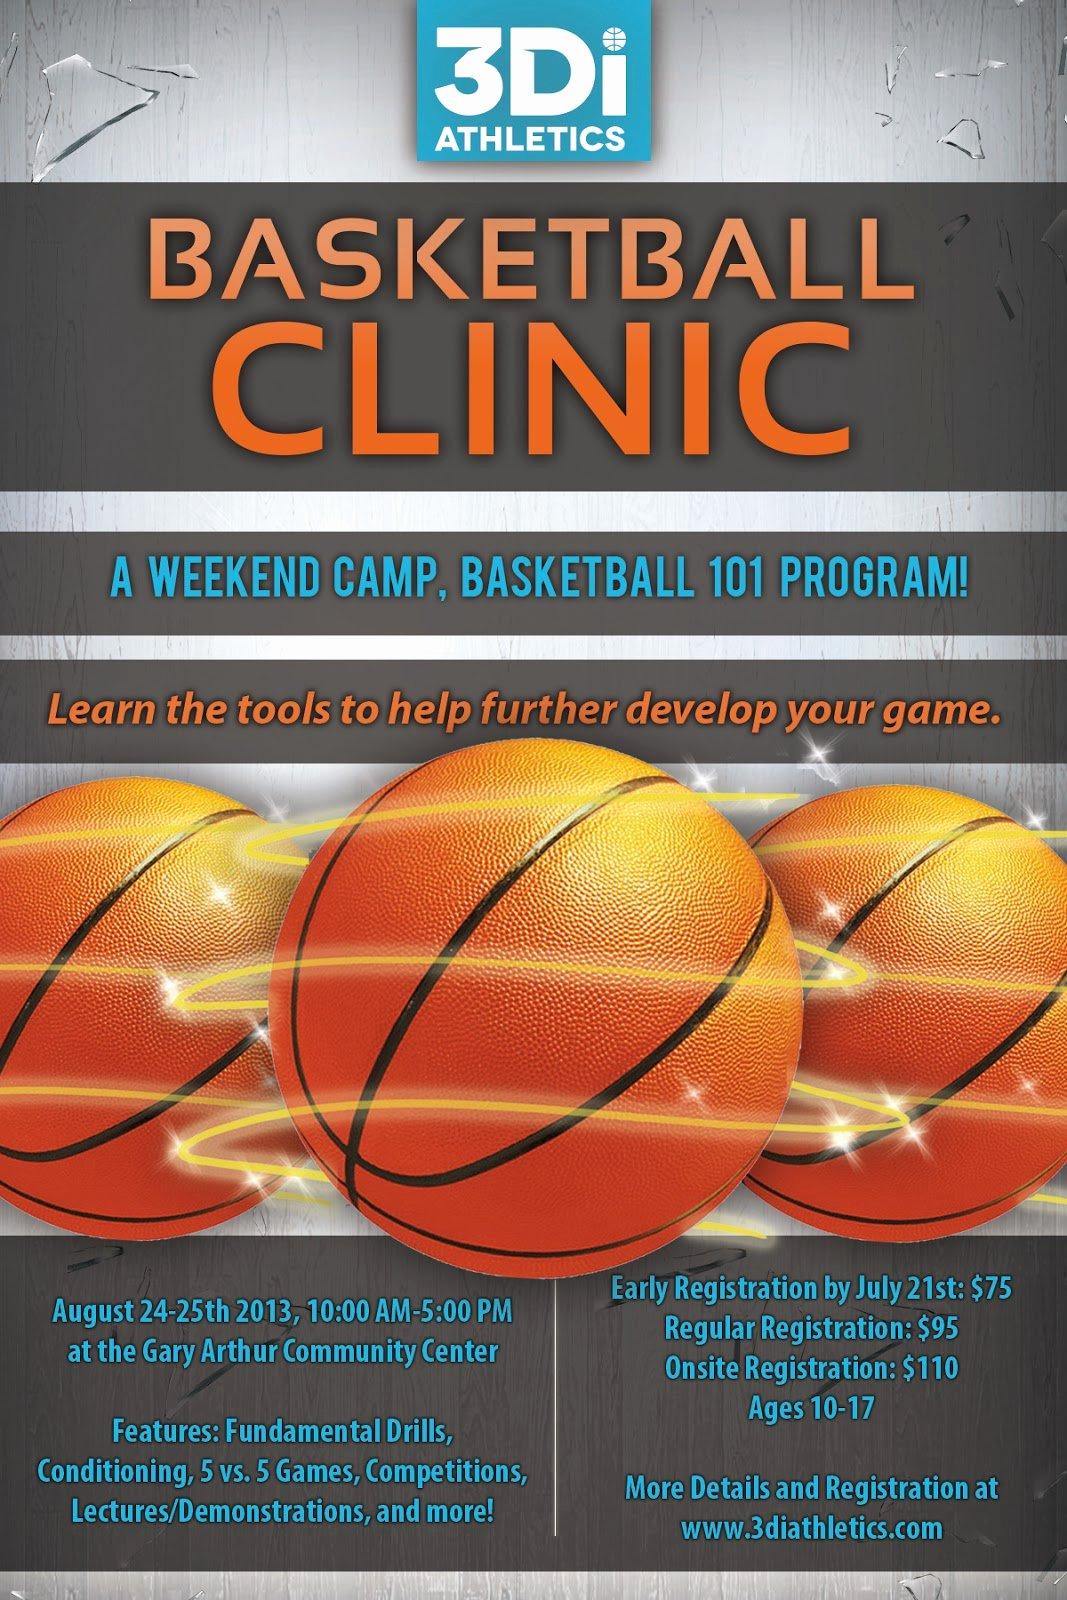 Basketball Camp Flyer Template Inspirational Ilia Munity Postings July 2013